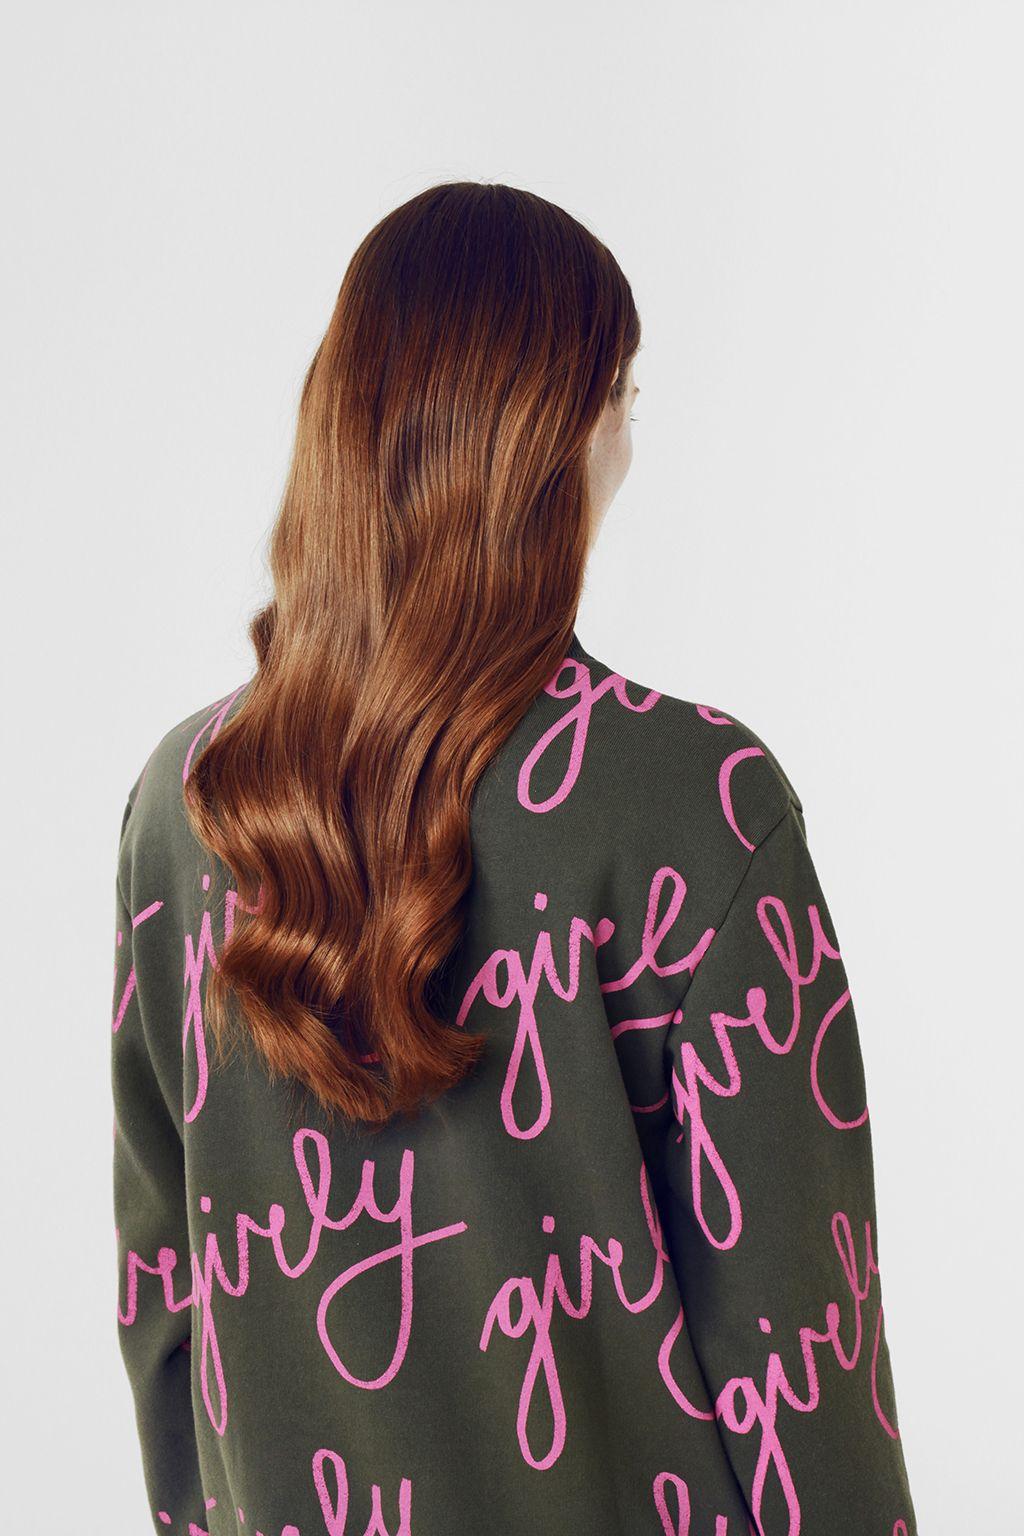 What's Inside You F/W 14-15 by Eleonora Carisi Photo by Sara Mautone Model Kristin Zakala MakeUp-Hair Giorgia Trezzi #whatsinsideyou